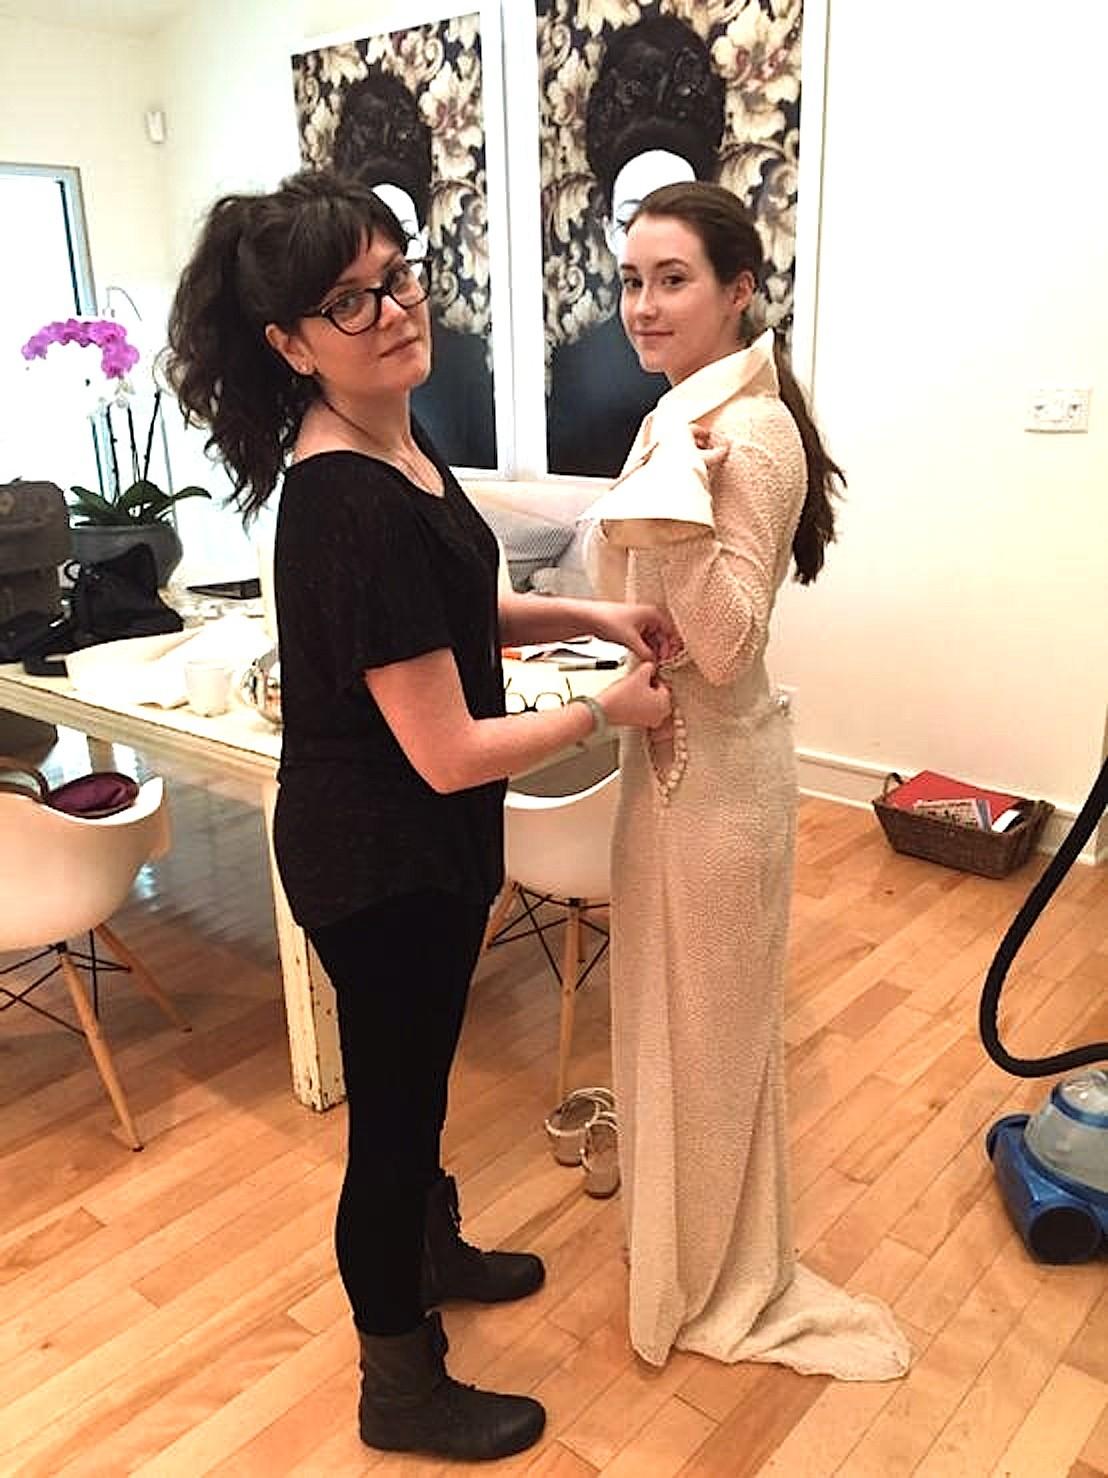 Kate wearing Micky Hoogendijk's first wedding dress